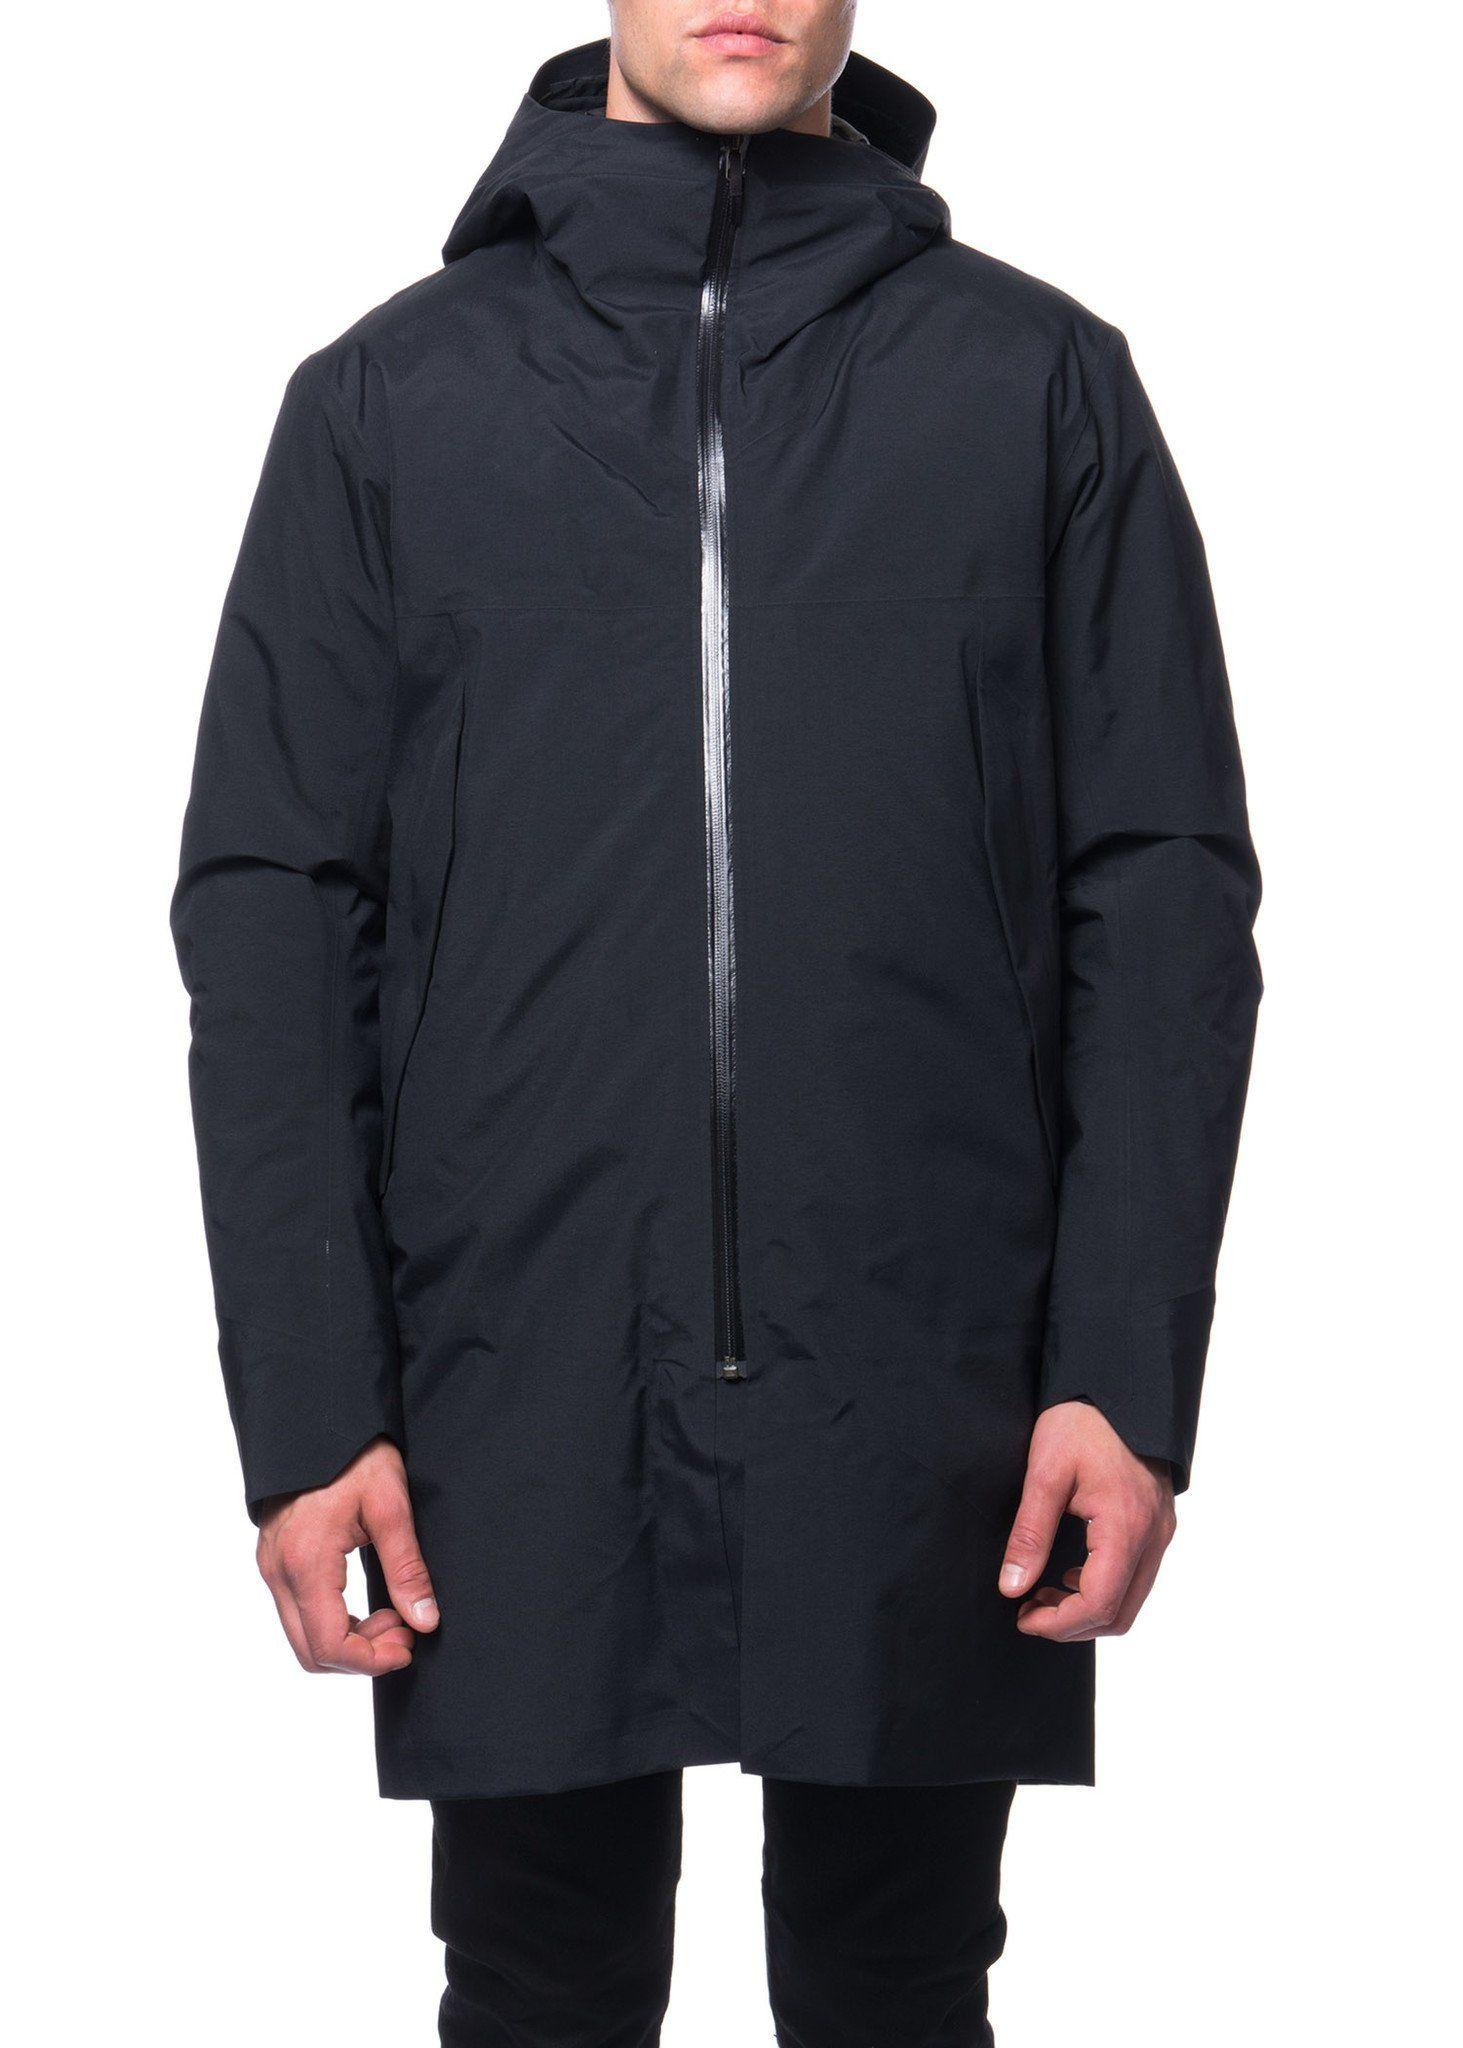 Arc'teryx Veilance FW16 Menswear Black long Monitor